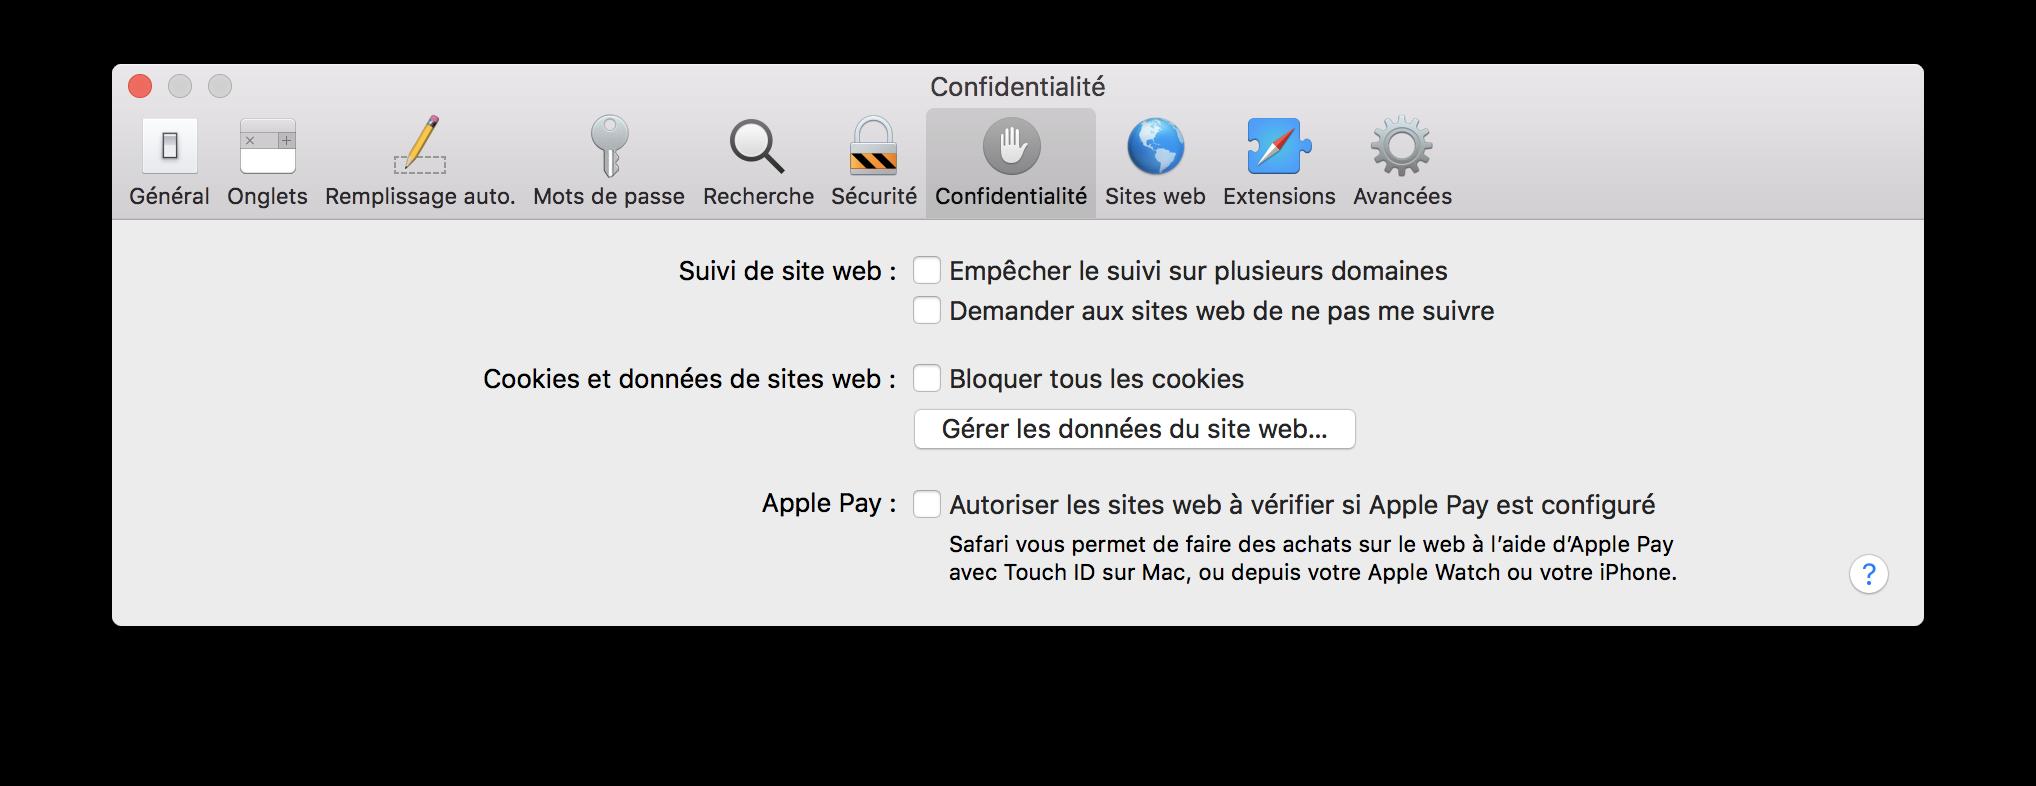 Sous MacOS 1012 Et Precedents